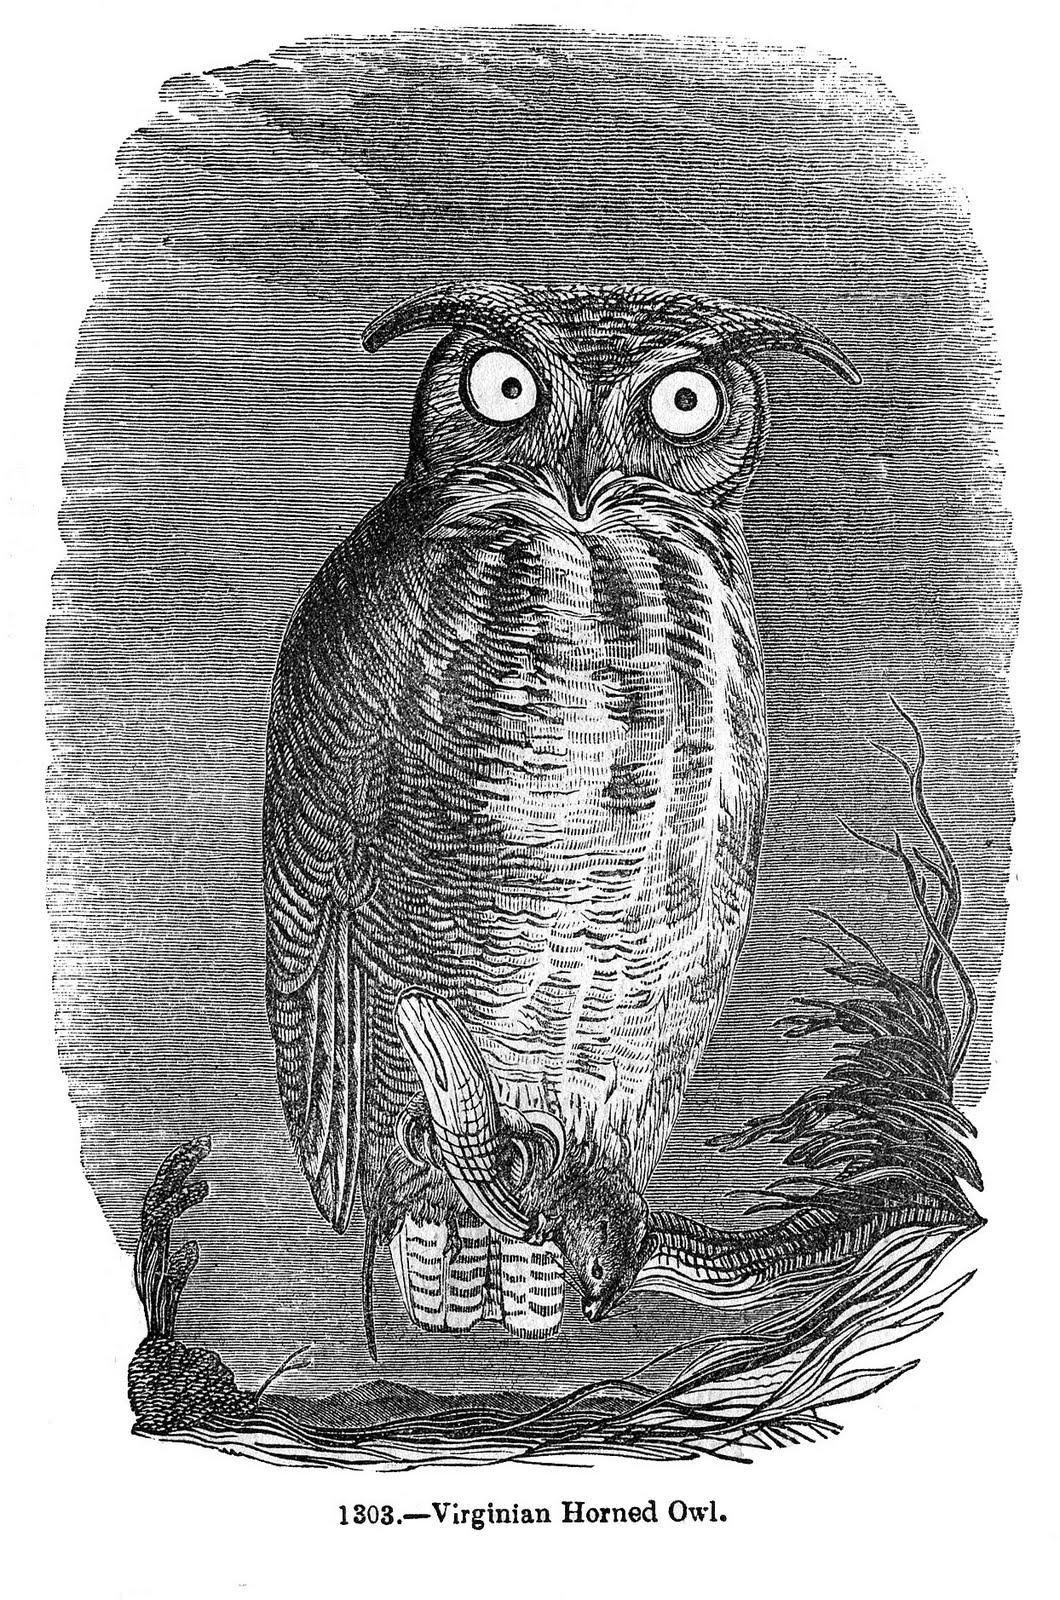 Vintage Halloween Clip Art - Spooky Owl - The Graphics Fairy